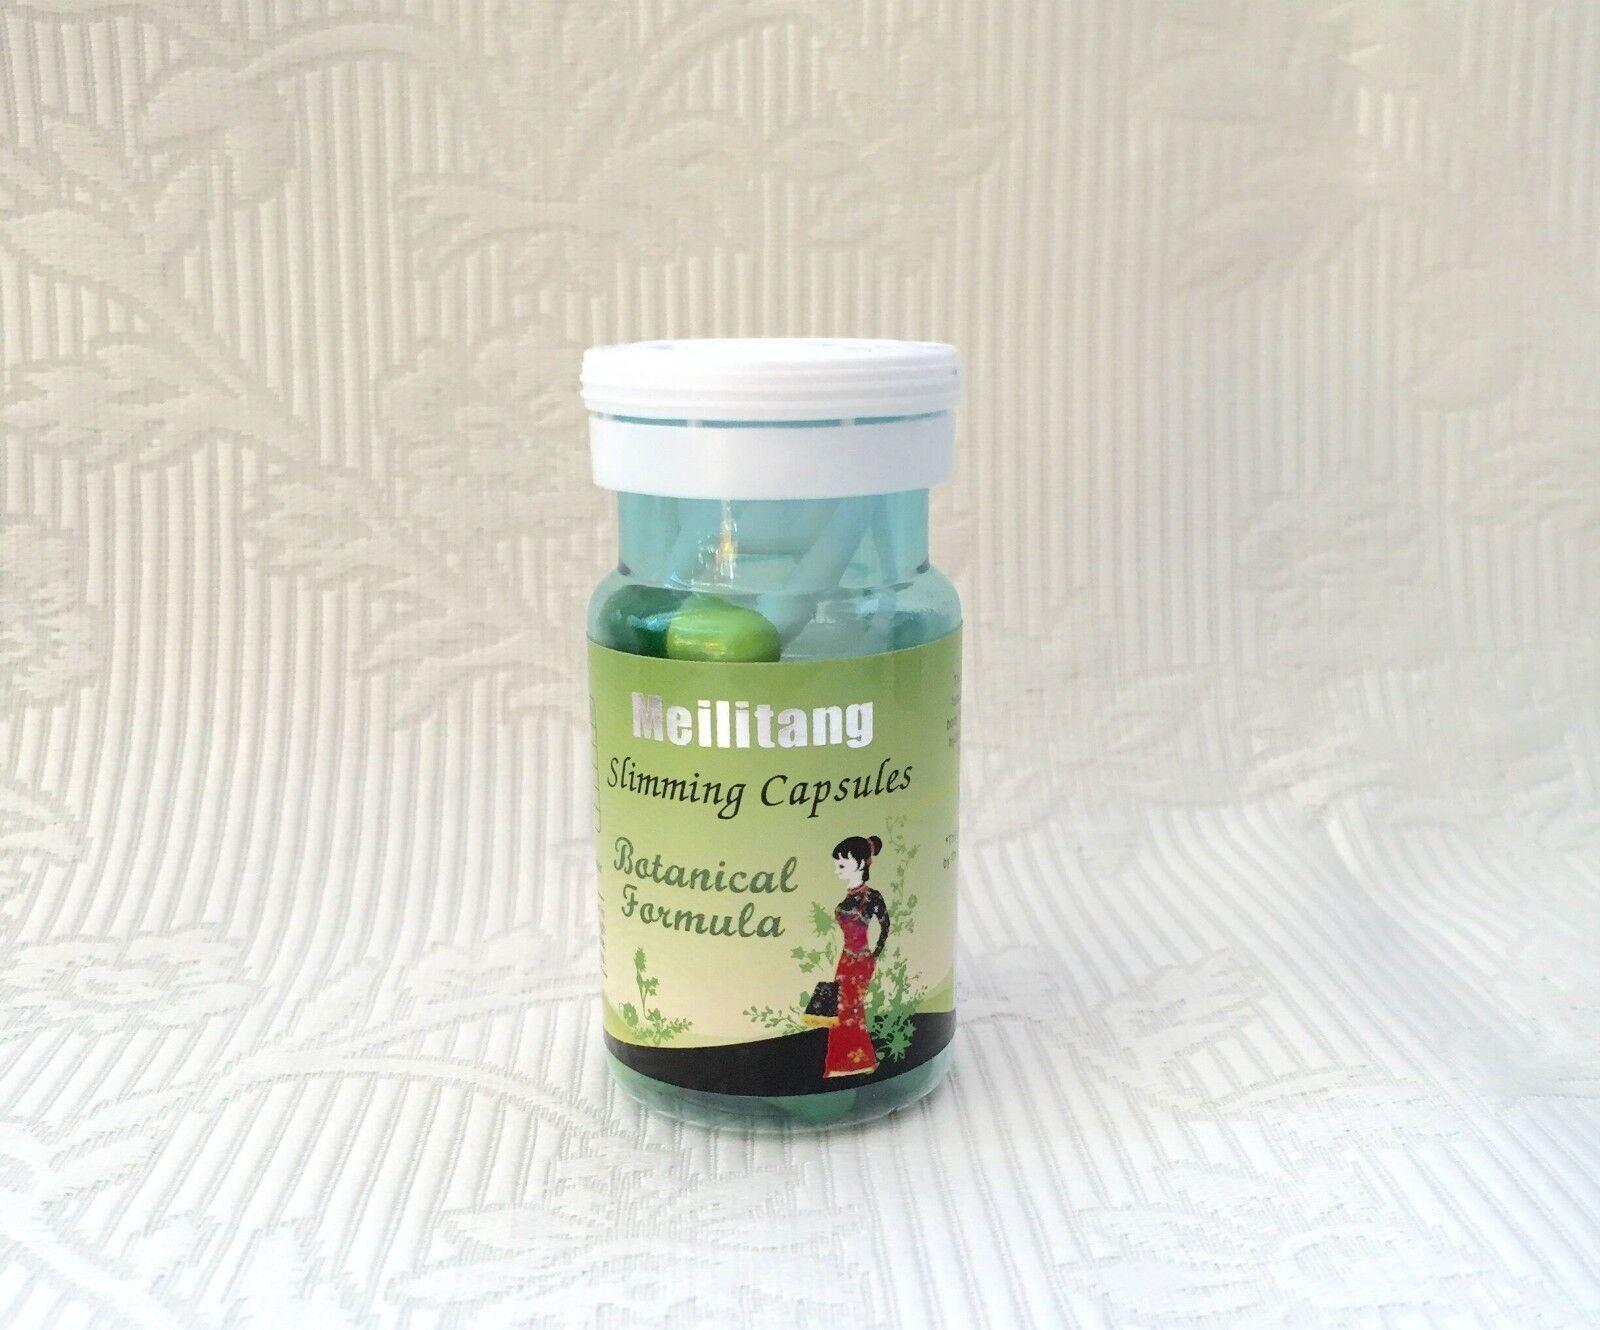 Meilitang Slimming Pill